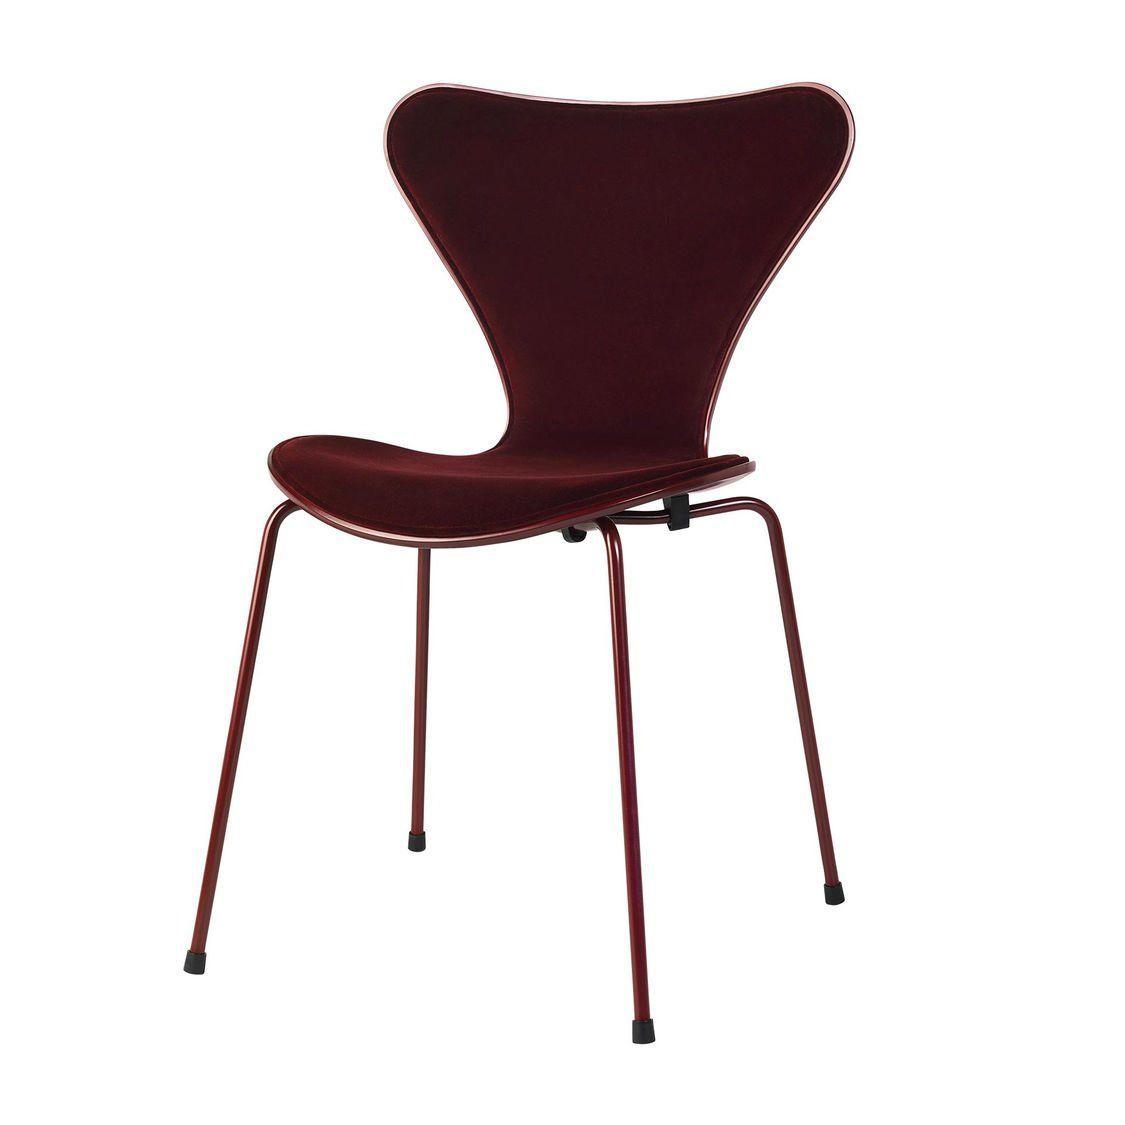 Fritz Hansen Limited Edition Series 7 Chair Velvet